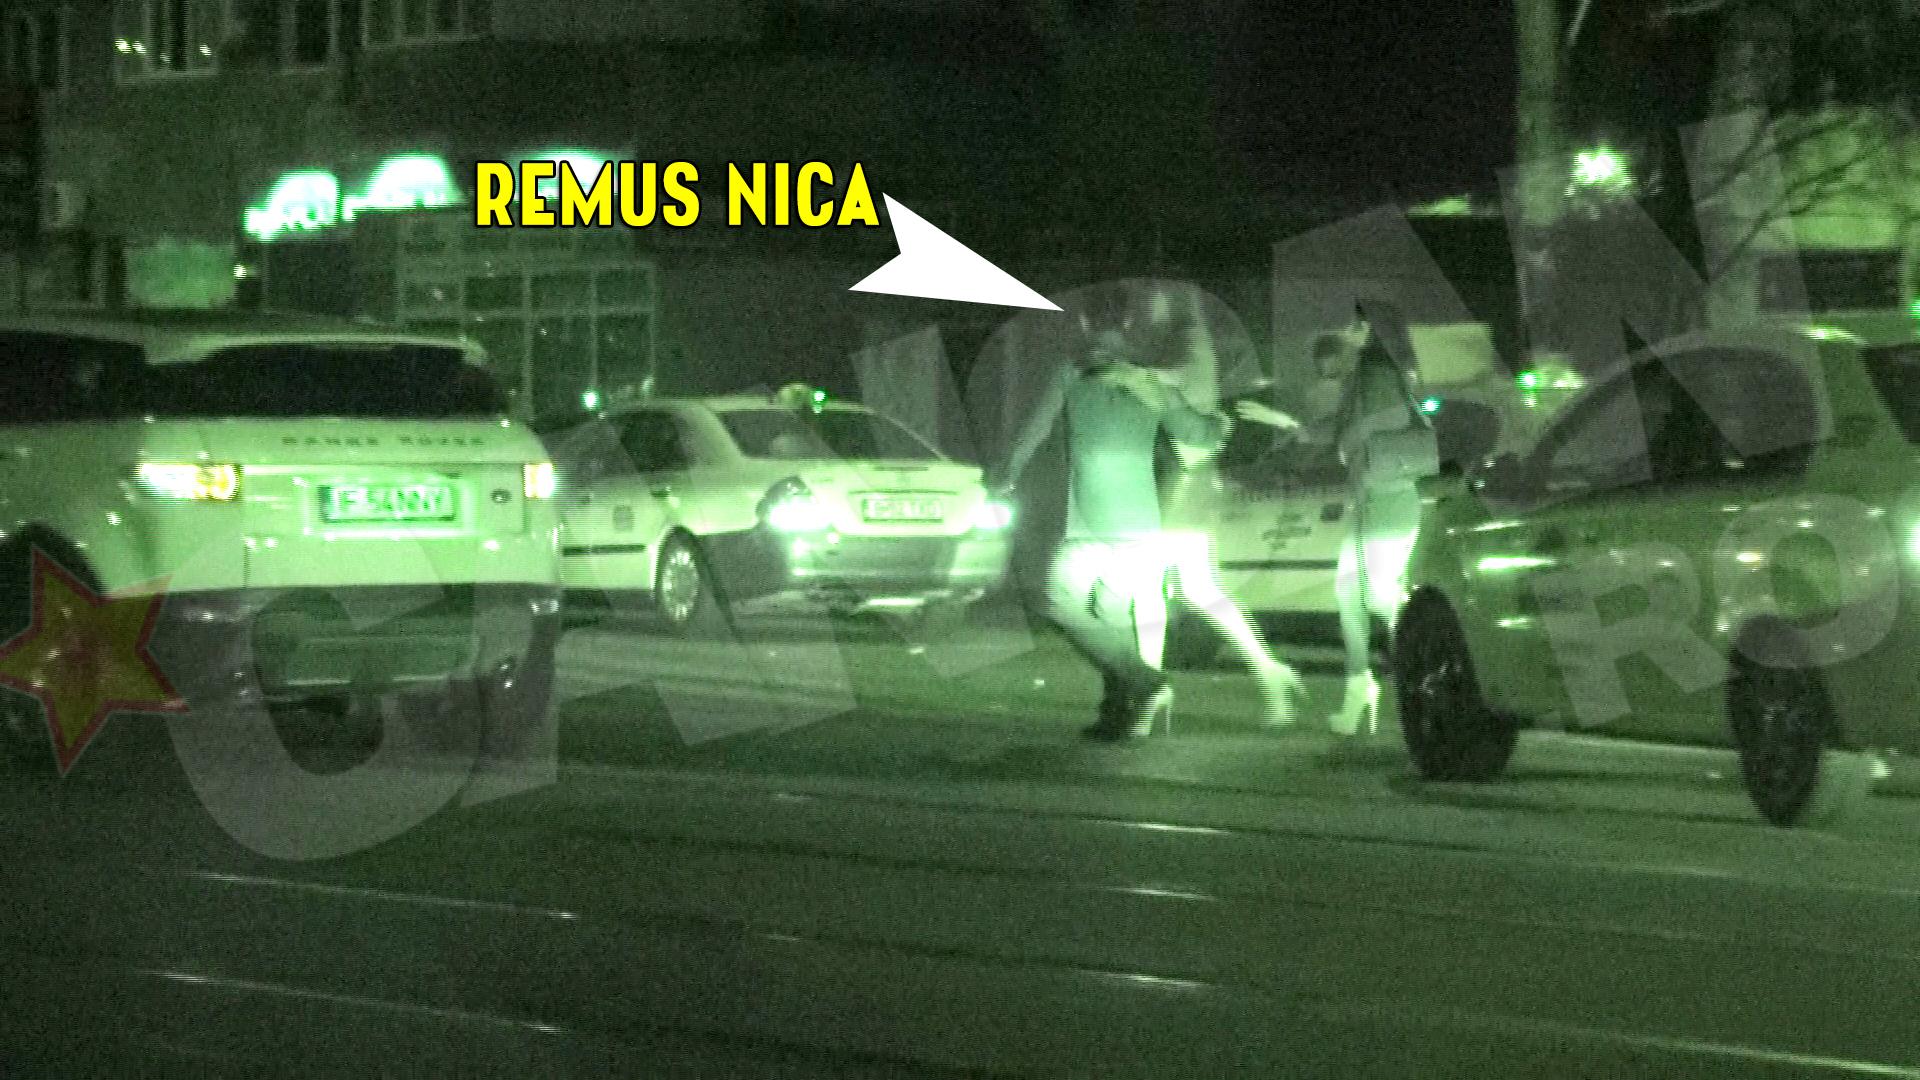 Remus Nica a iesit din club in compania a doua domnisoare